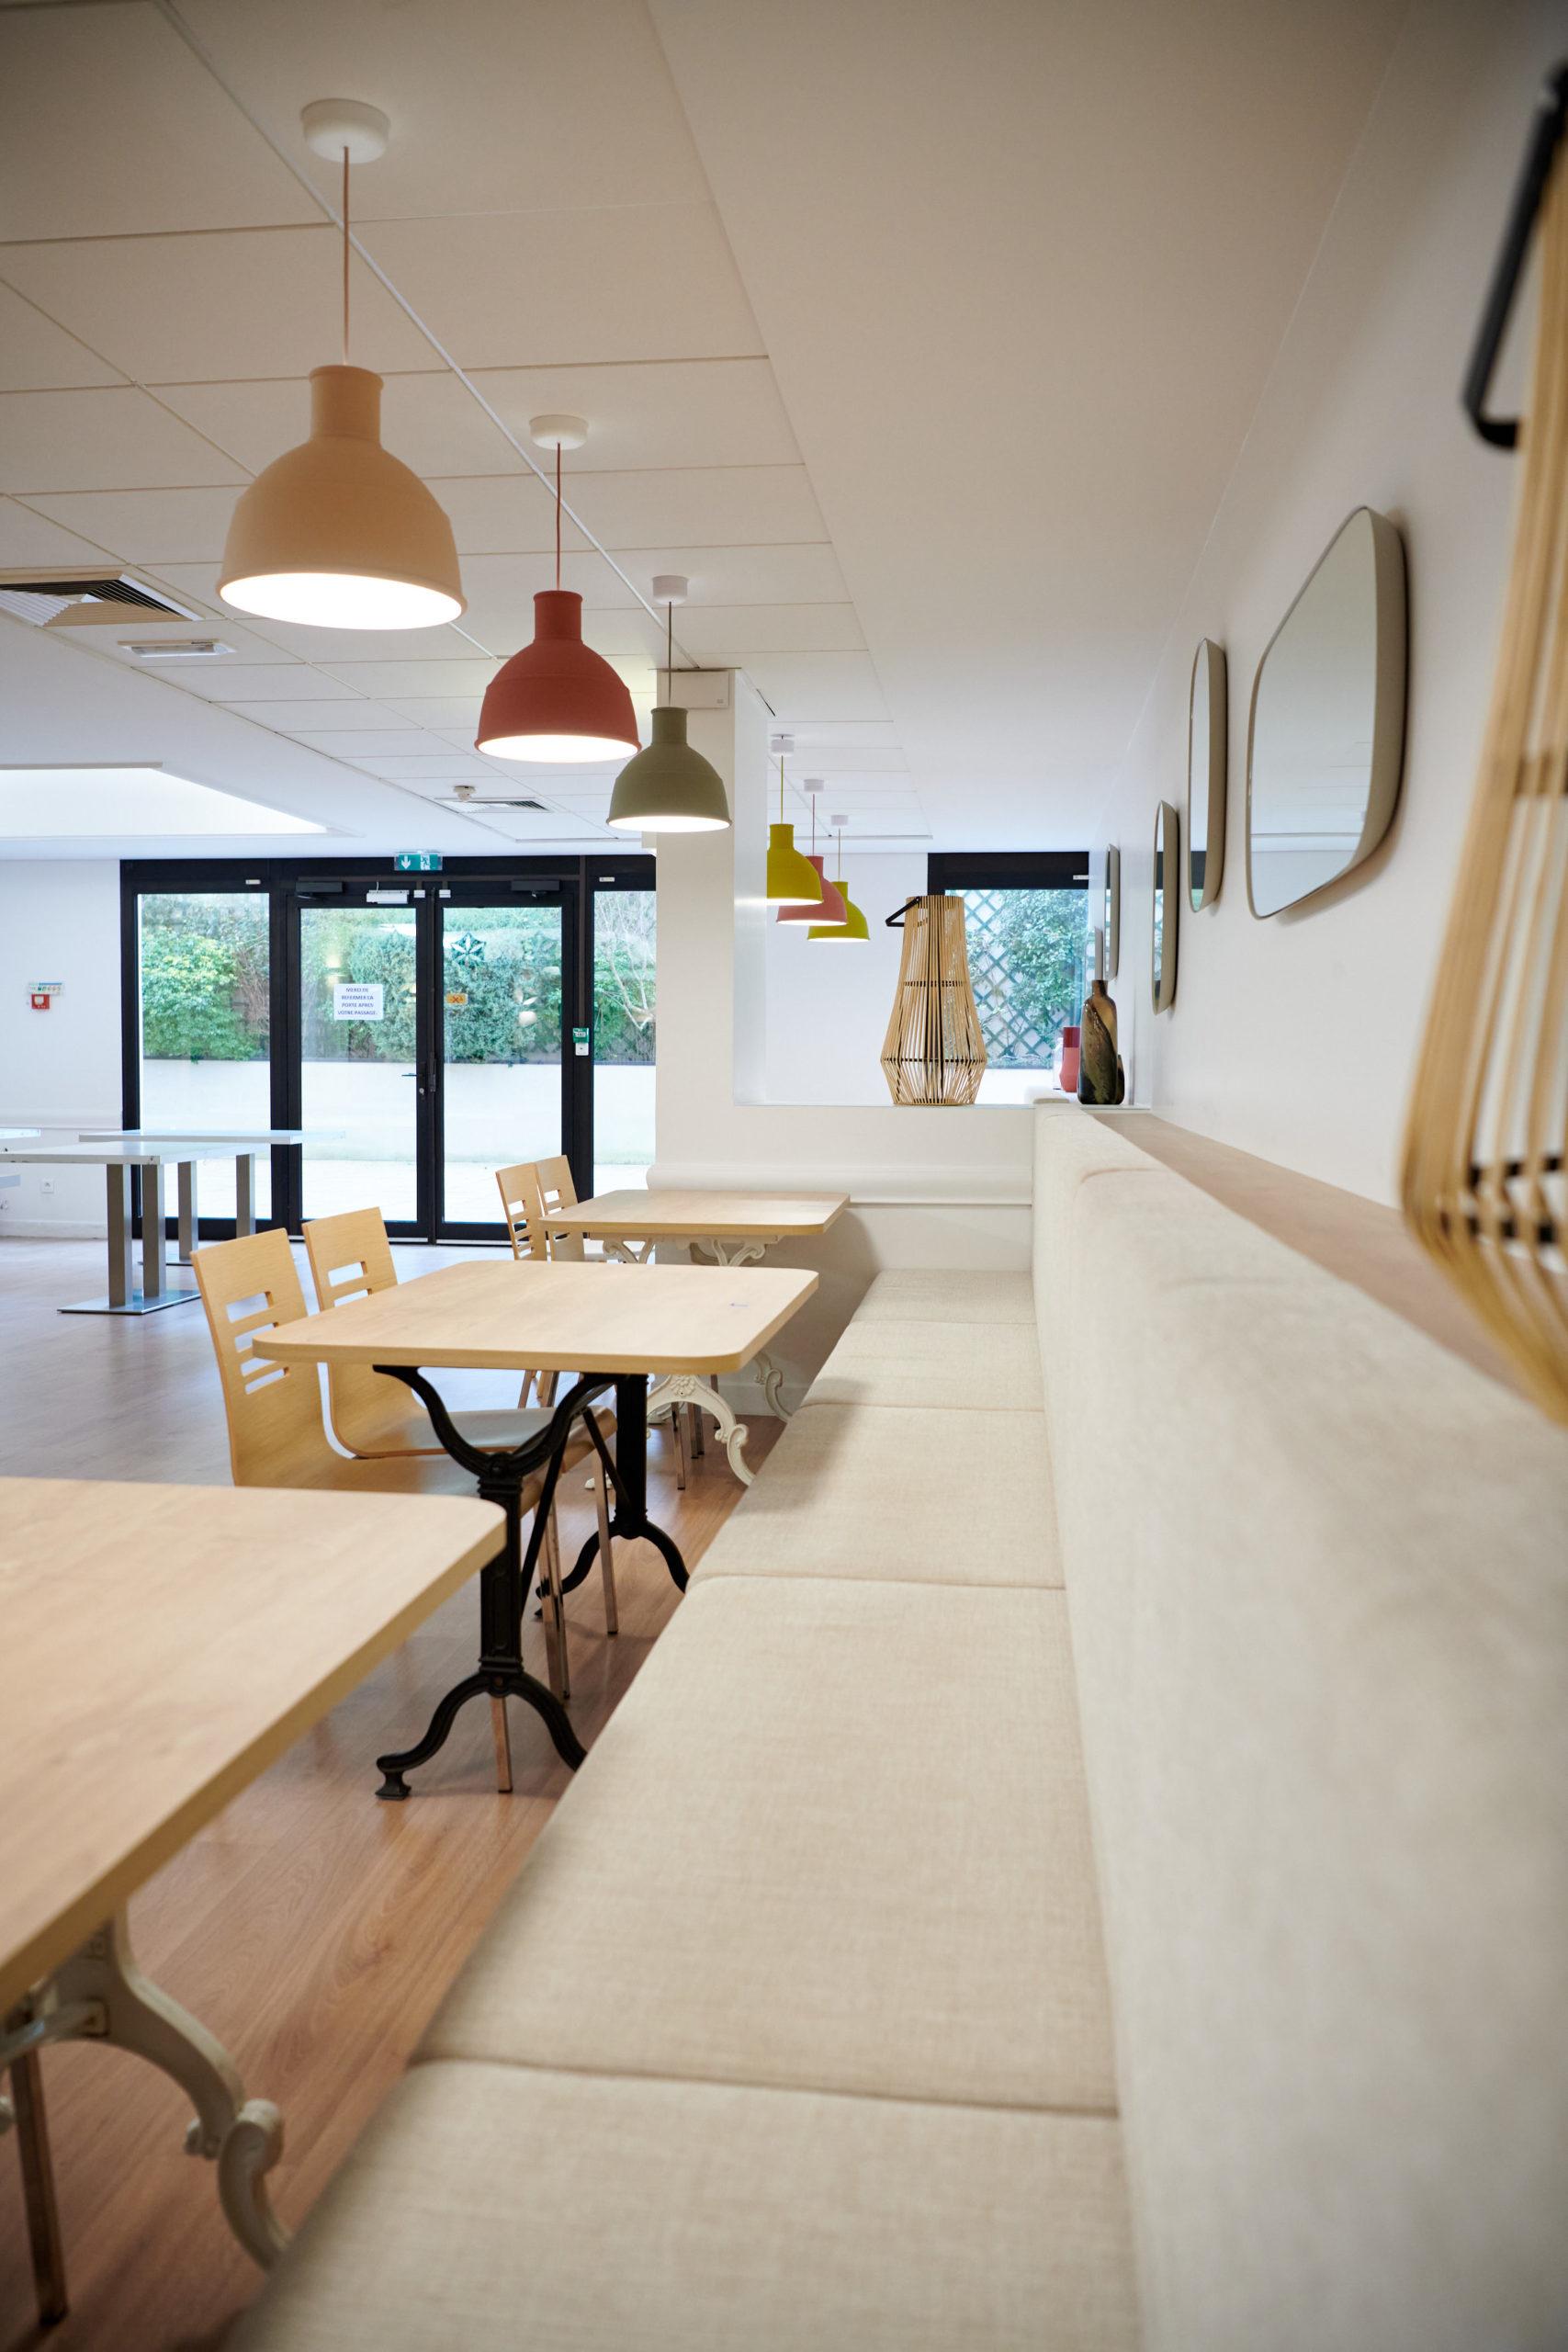 Sogasi-Chaises restauration-Tables restaurations-Luminaire suspendus